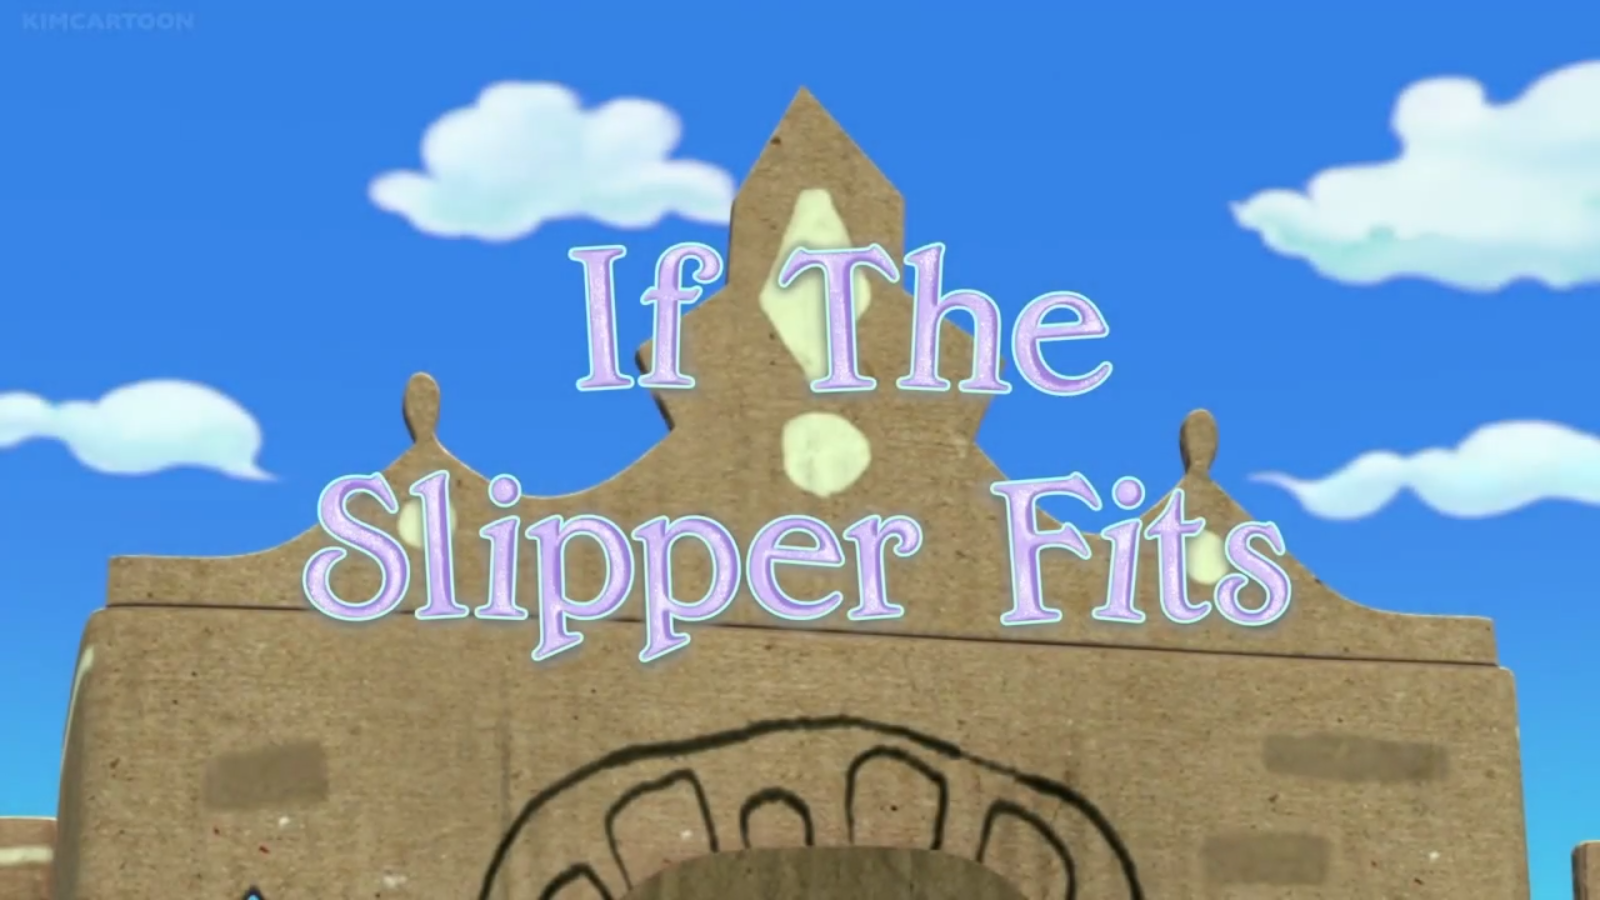 If the Slipper Fits